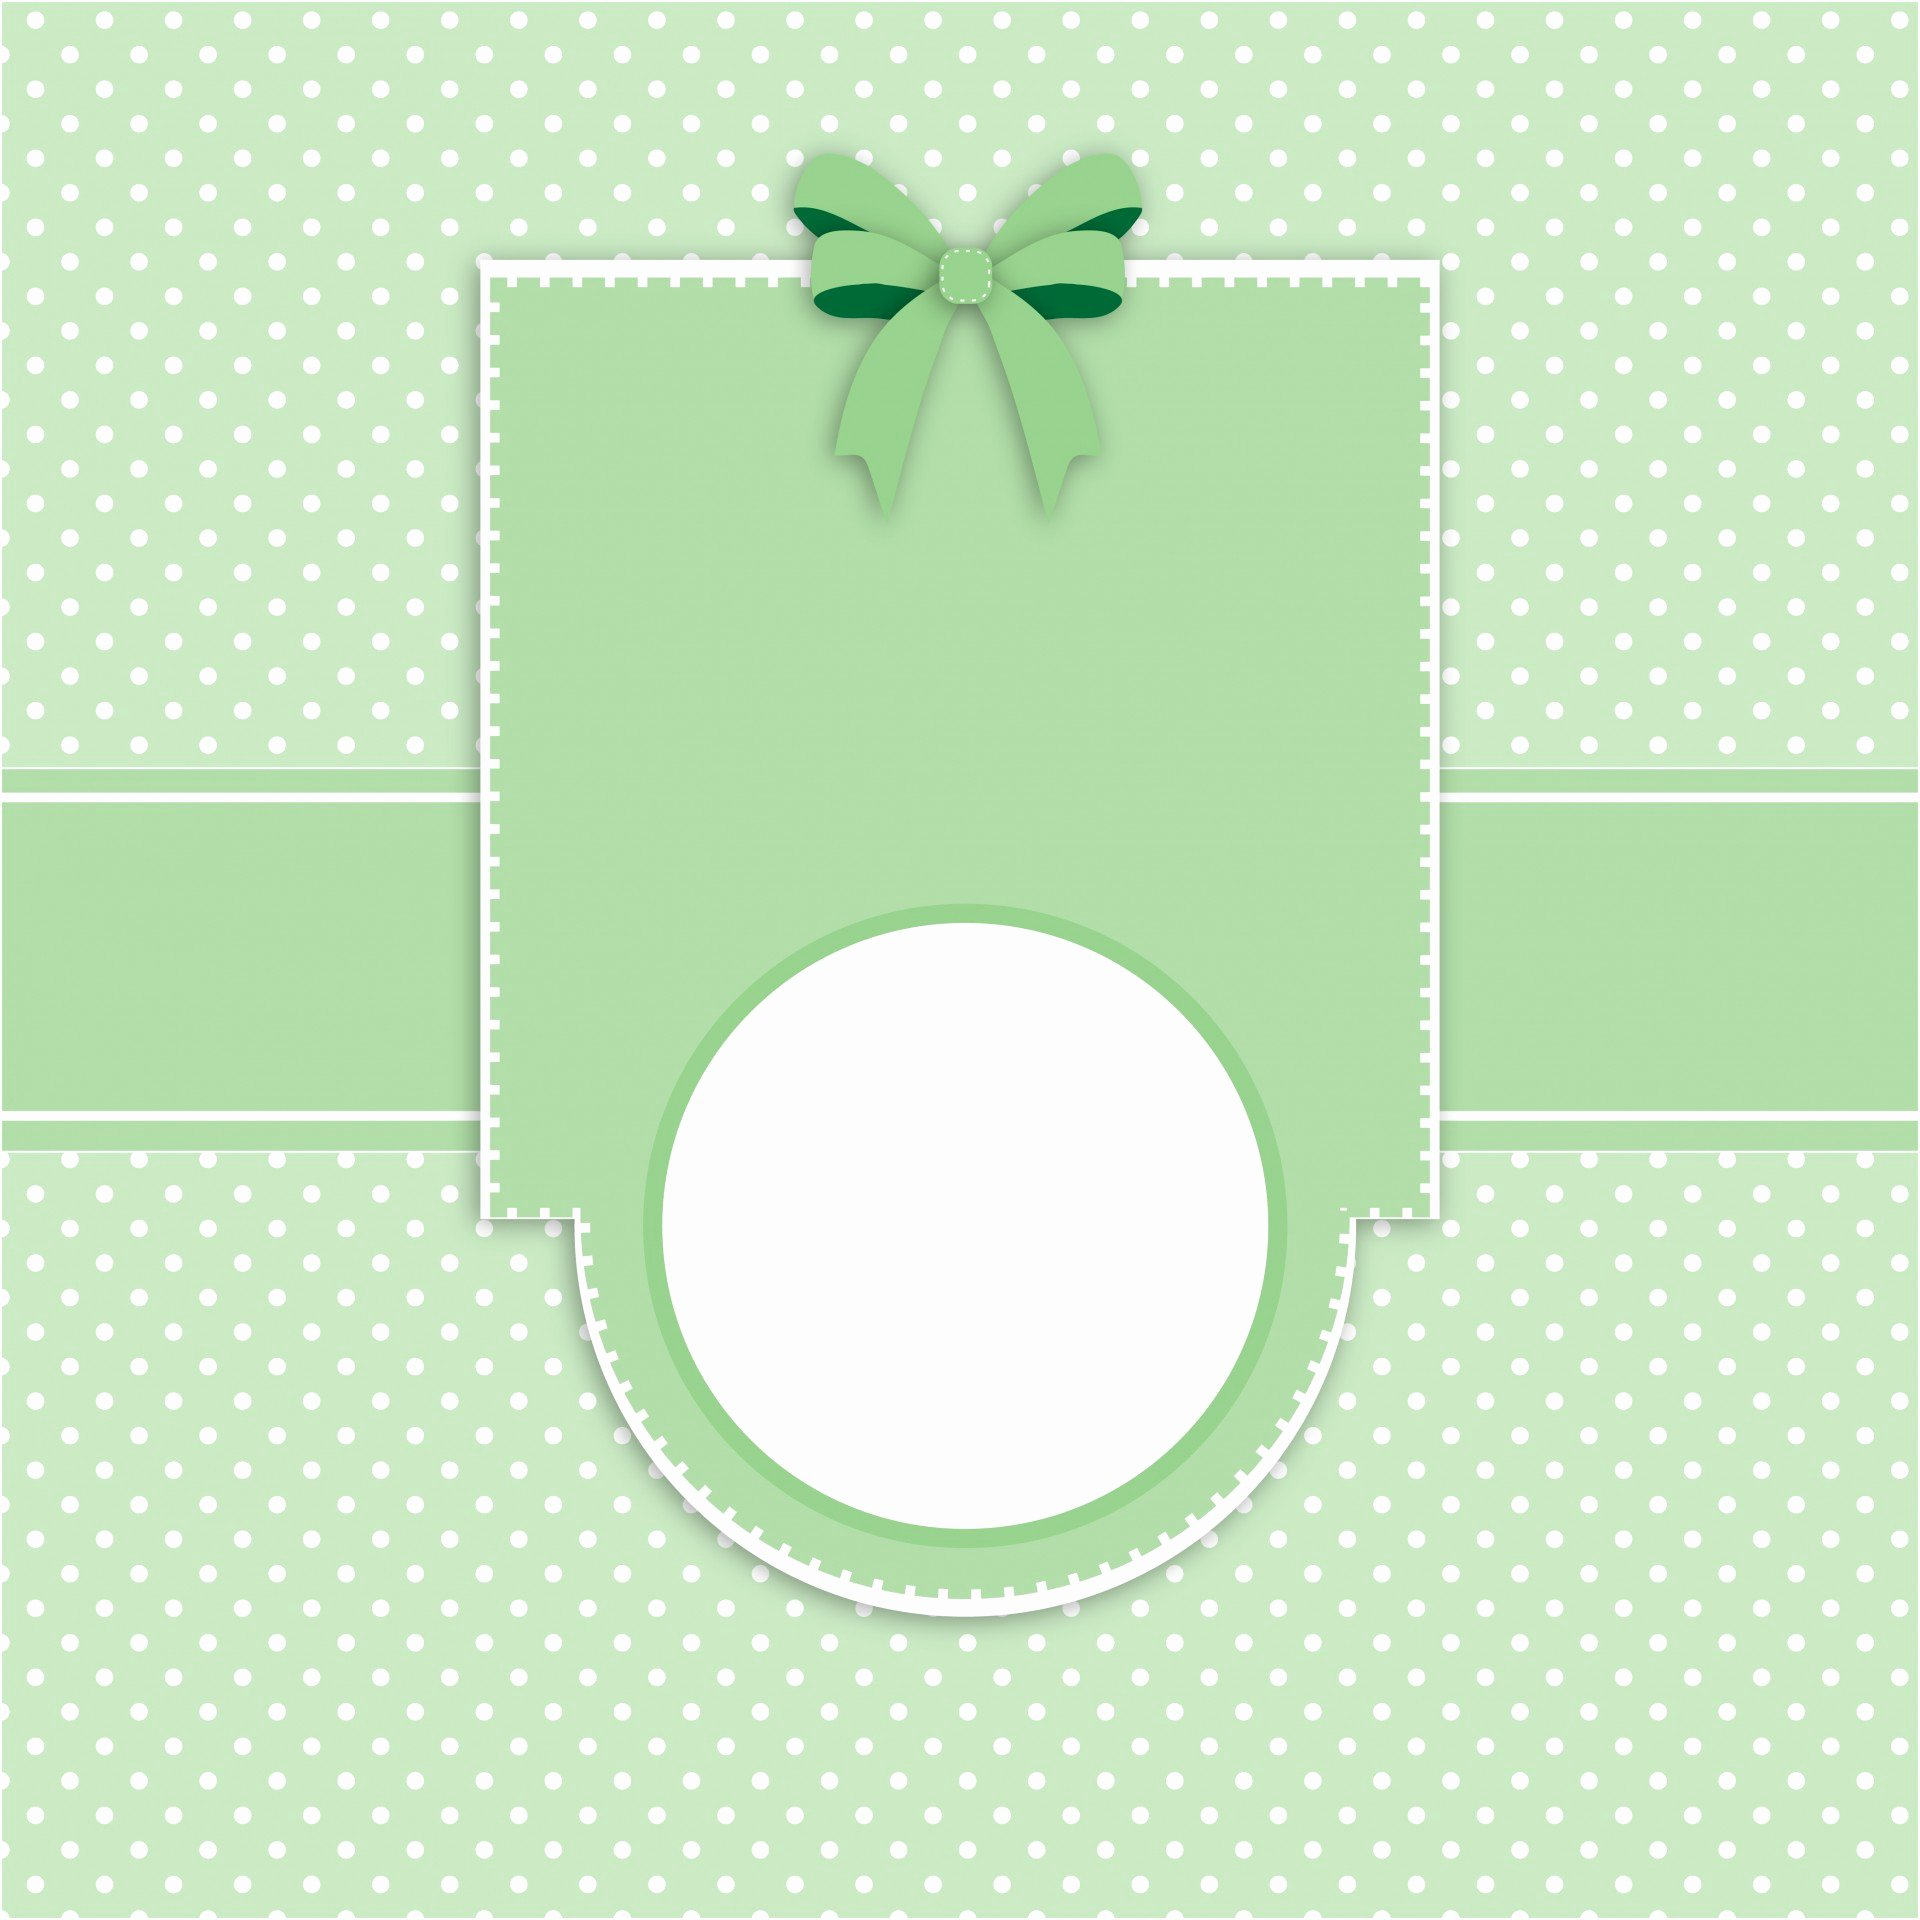 Polka Dot Invitation Template Best Of Card Invitation Polka Dots Template Free Stock